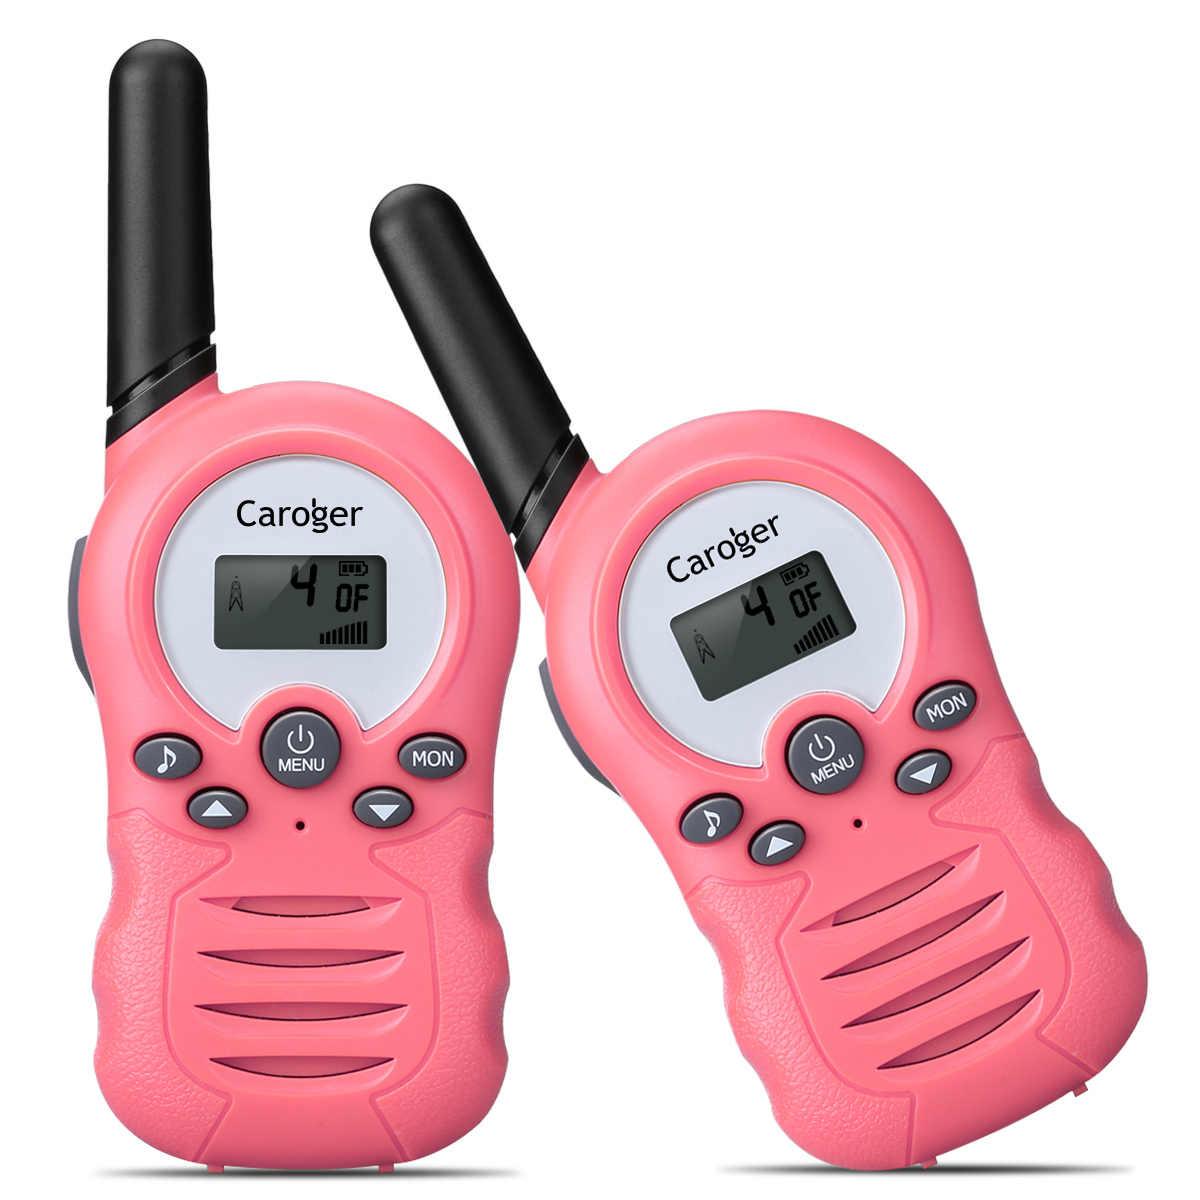 Caroger CR388A License Free Walkie Talkies Two Way Radio Up